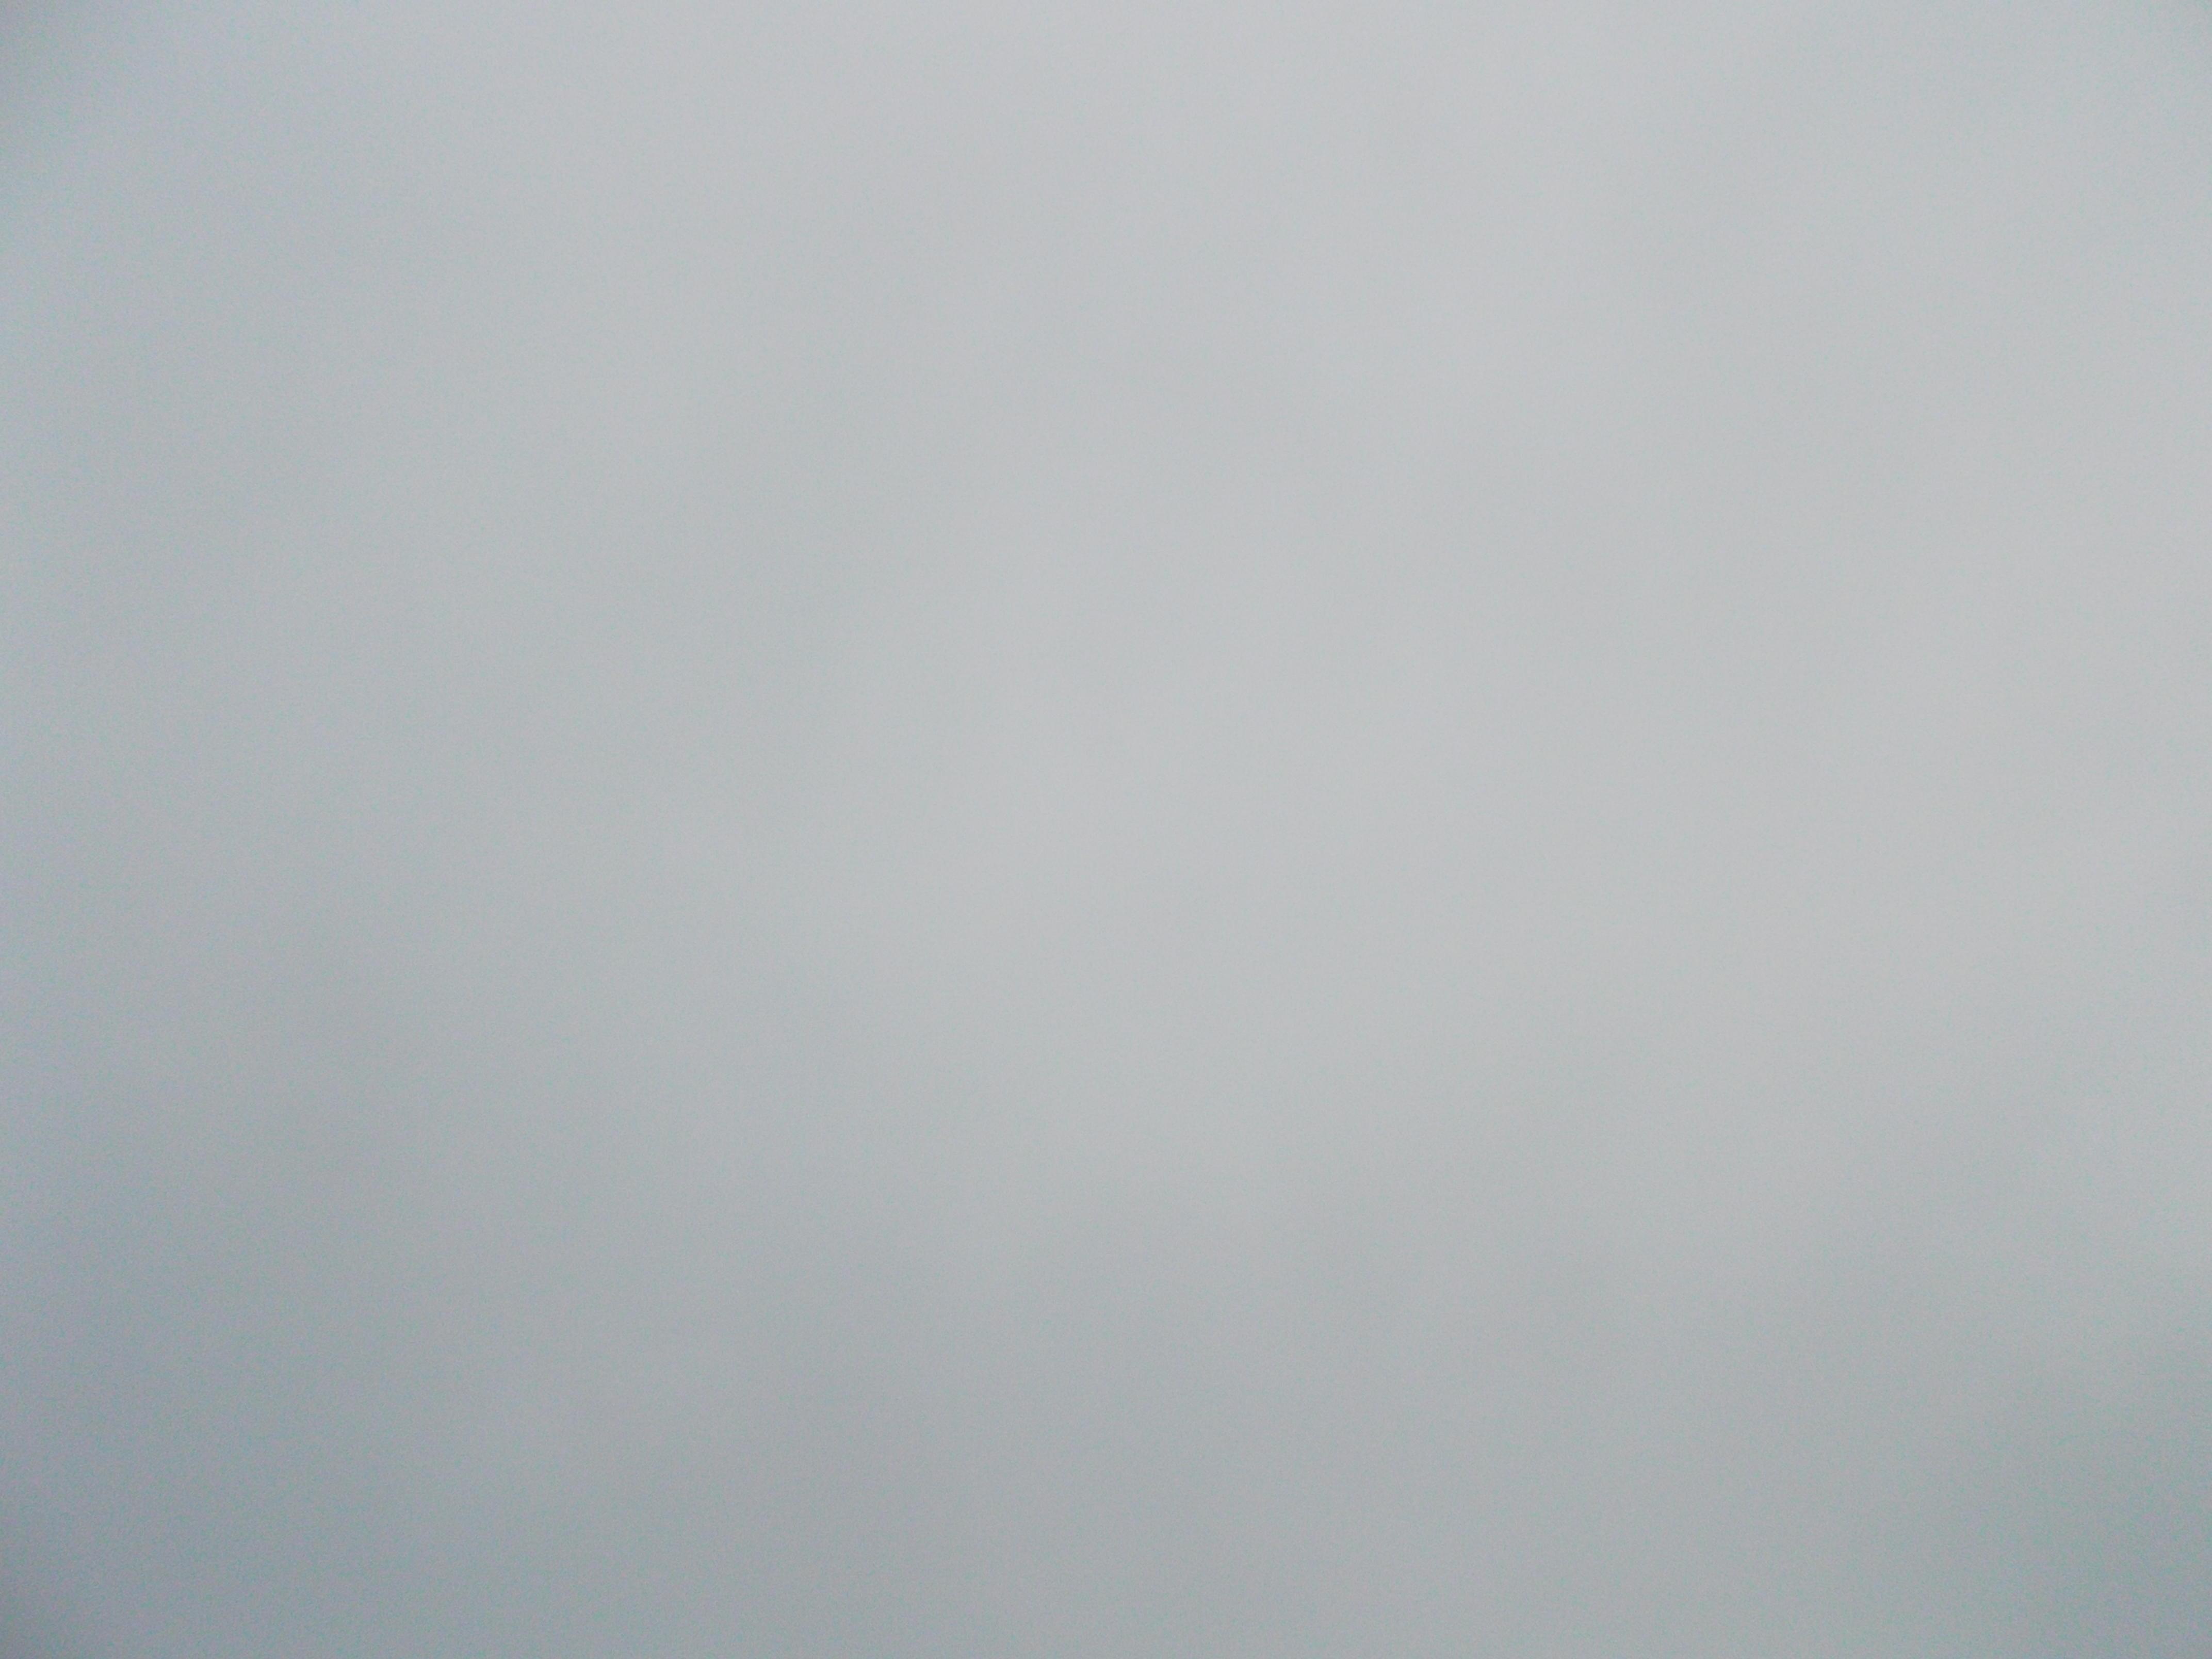 2013-03-10 Longitude -0.360578 Latitude 49.168919 Altitude 29 Heure 13h20